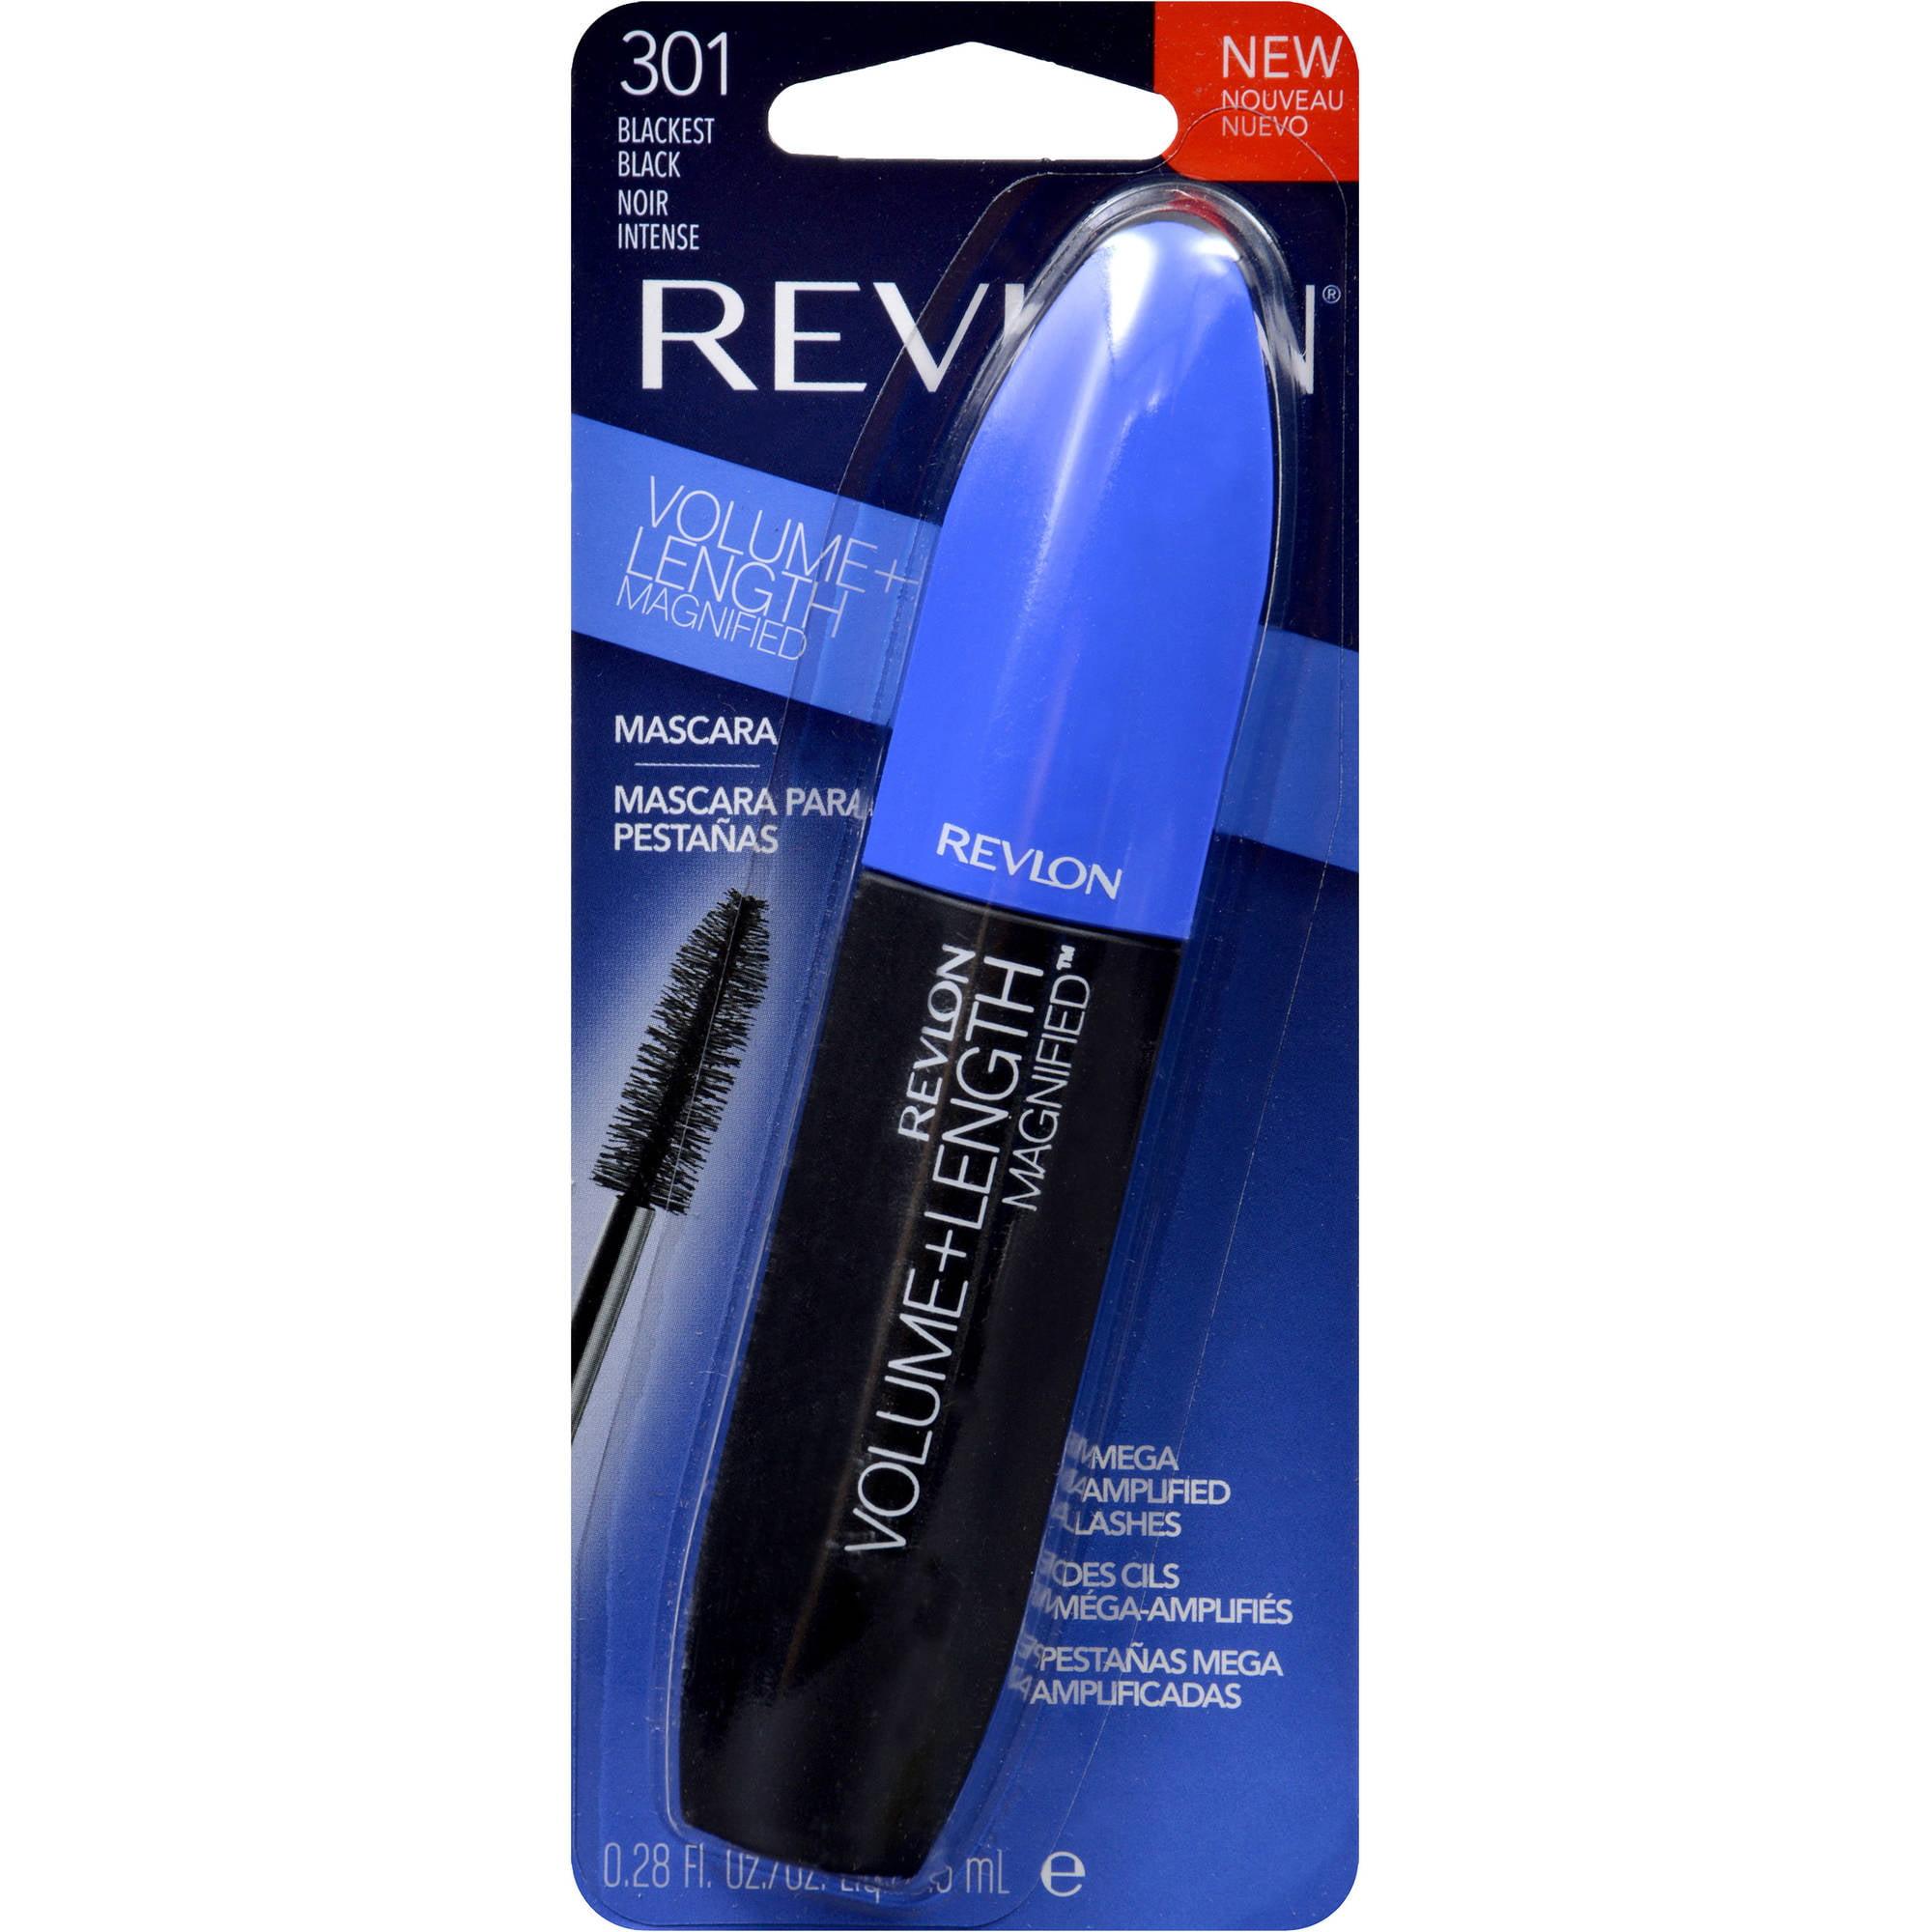 Revlon Volume + Length Magnified Mascara, 0.28 fl oz